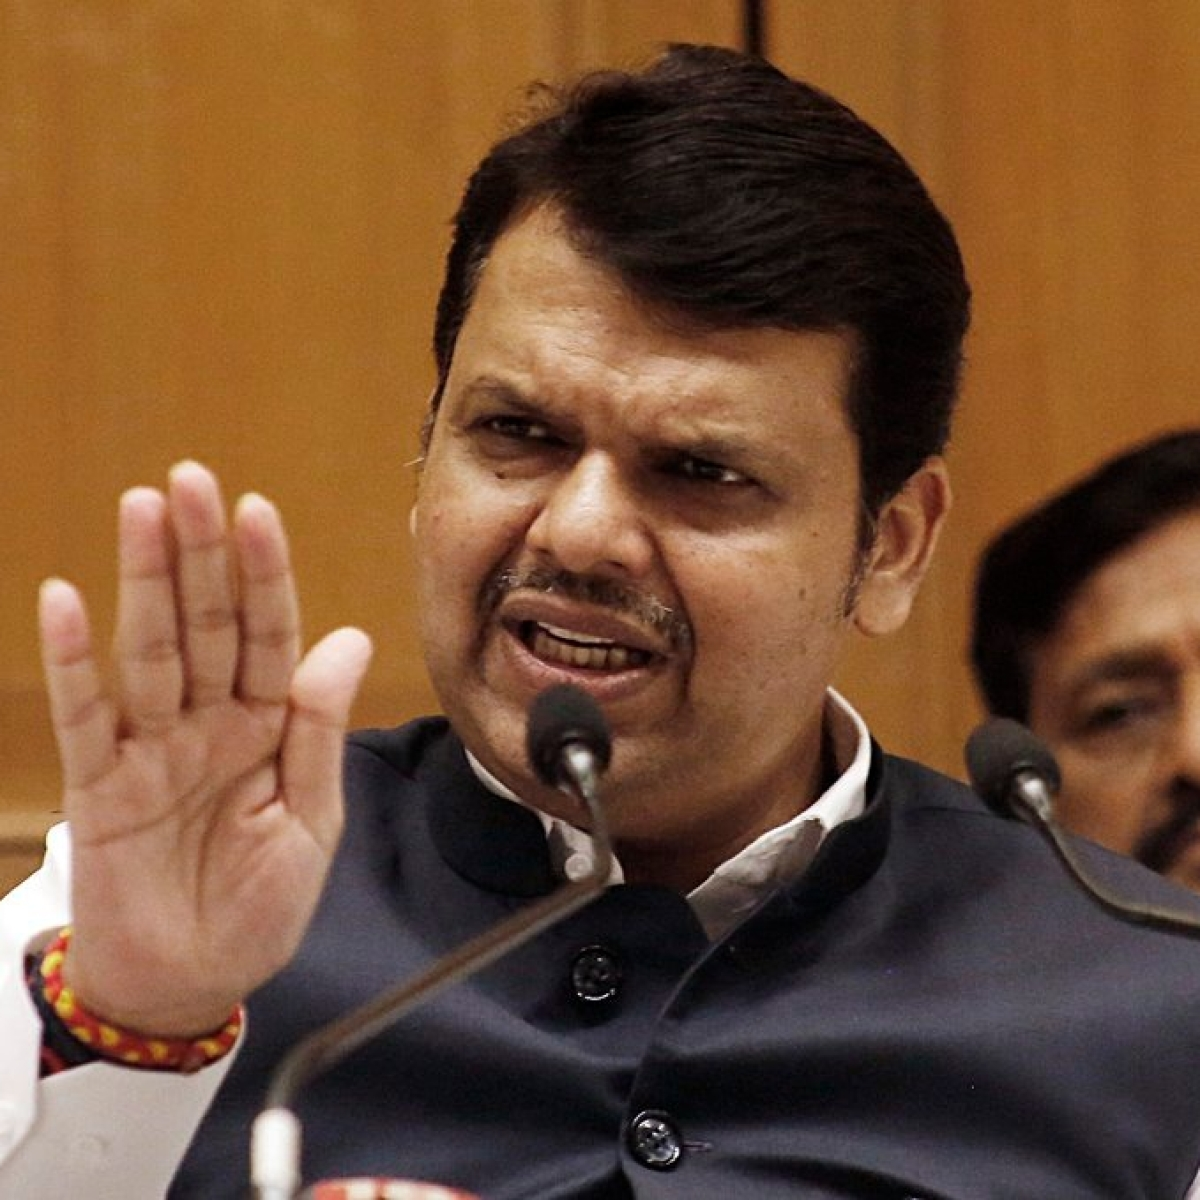 Former Maha CM Devendra Fadnavis appears before Nagpur court for non-disclosure of criminal cases, gets bail